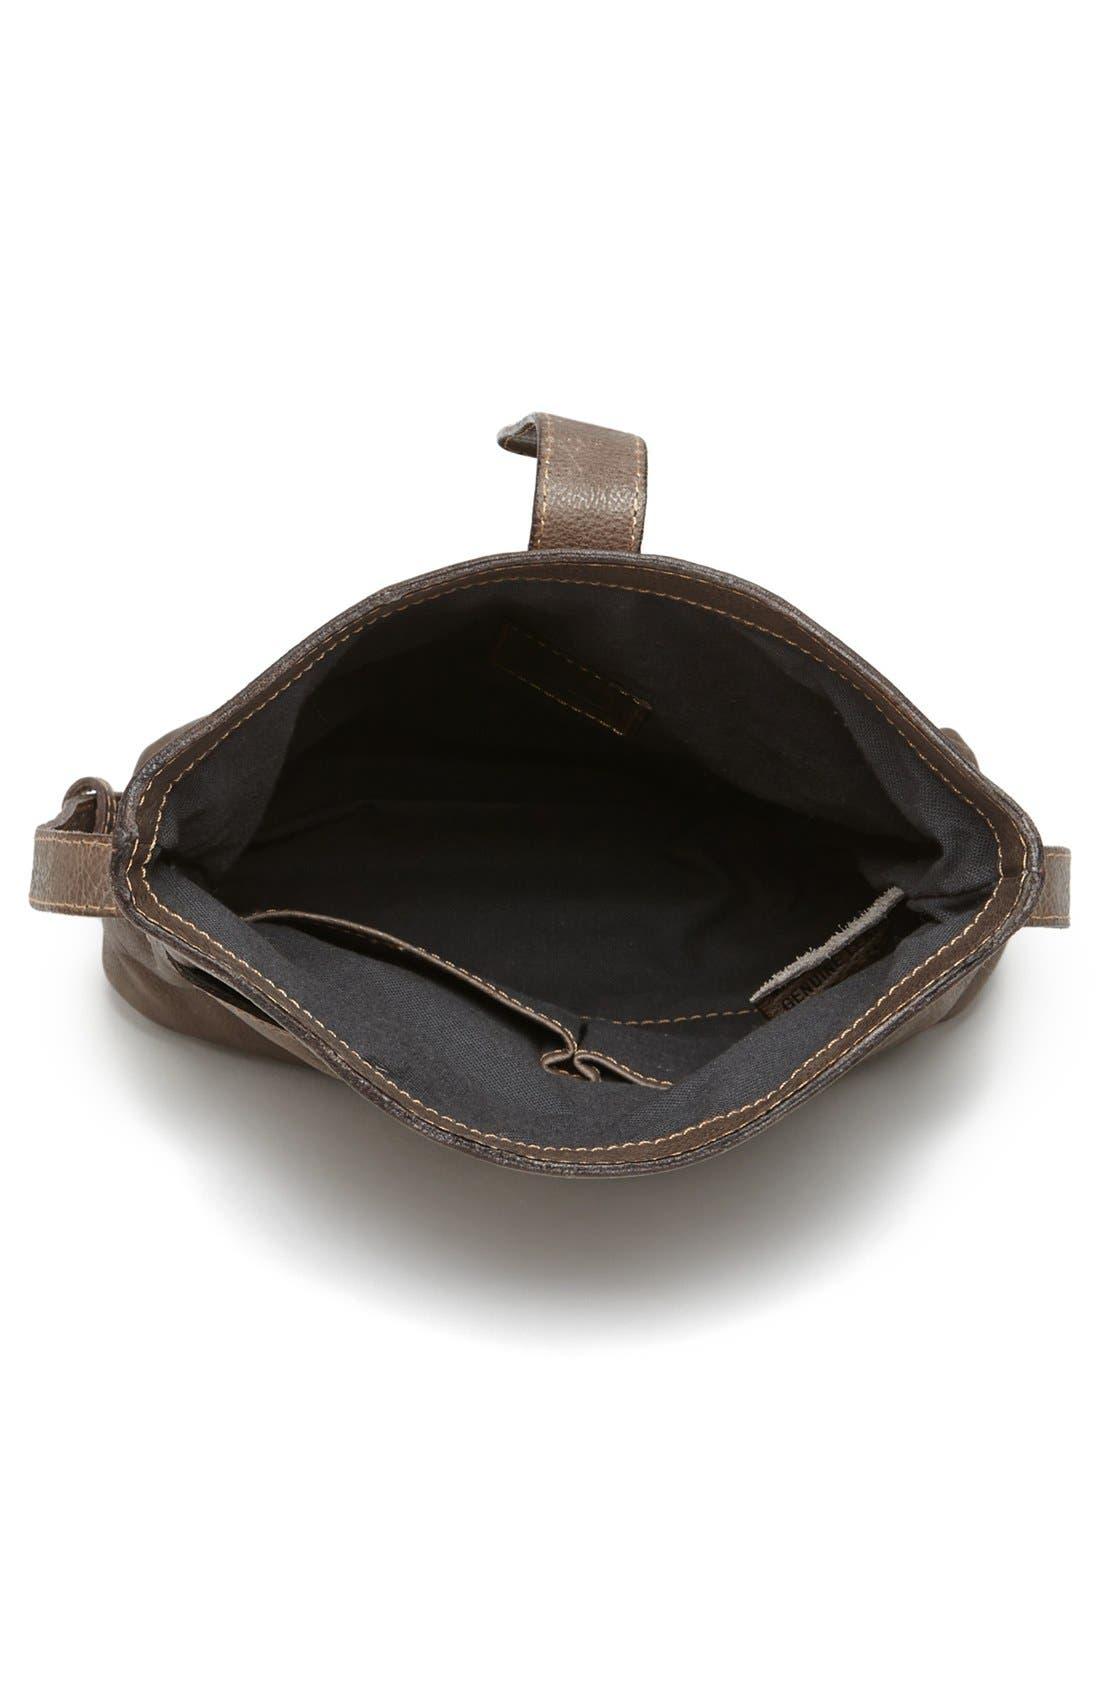 Alternate Image 3  - Frye 'Artisan Foldover' Leather Crossbody Bag